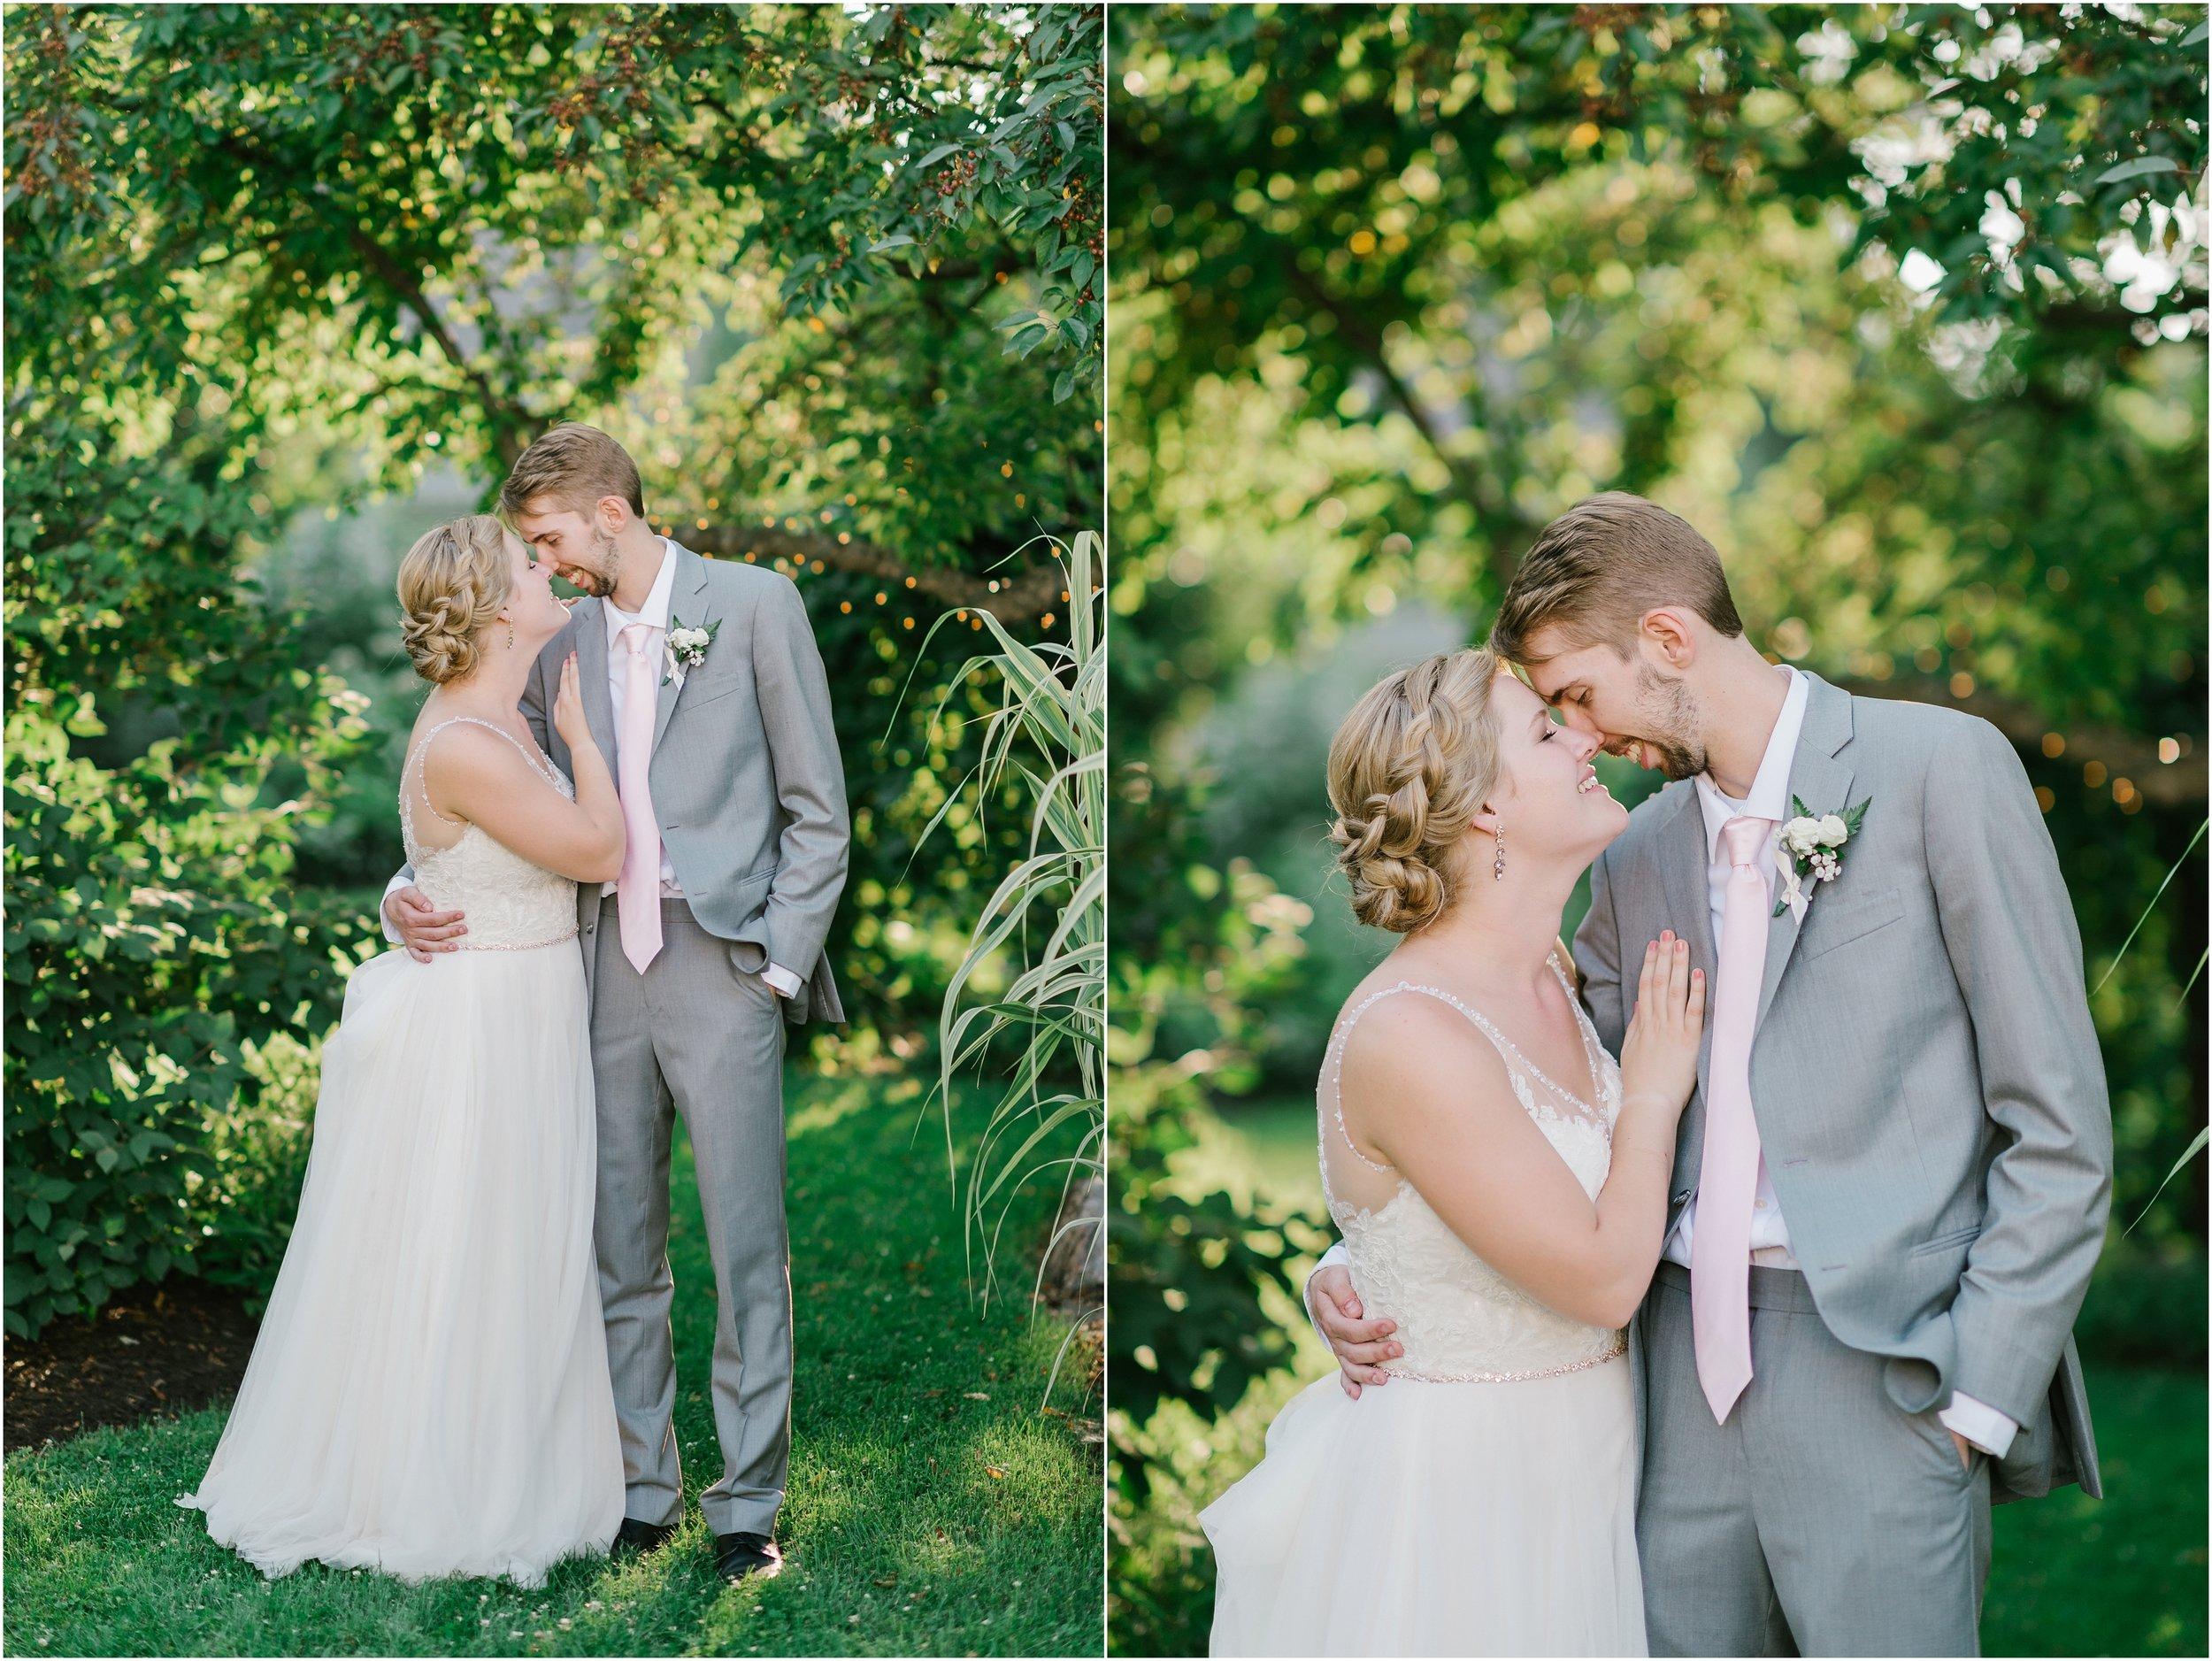 Rebecca_Shehorn_Photography_Indianapolis_Wedding_Photographer_8521.jpg